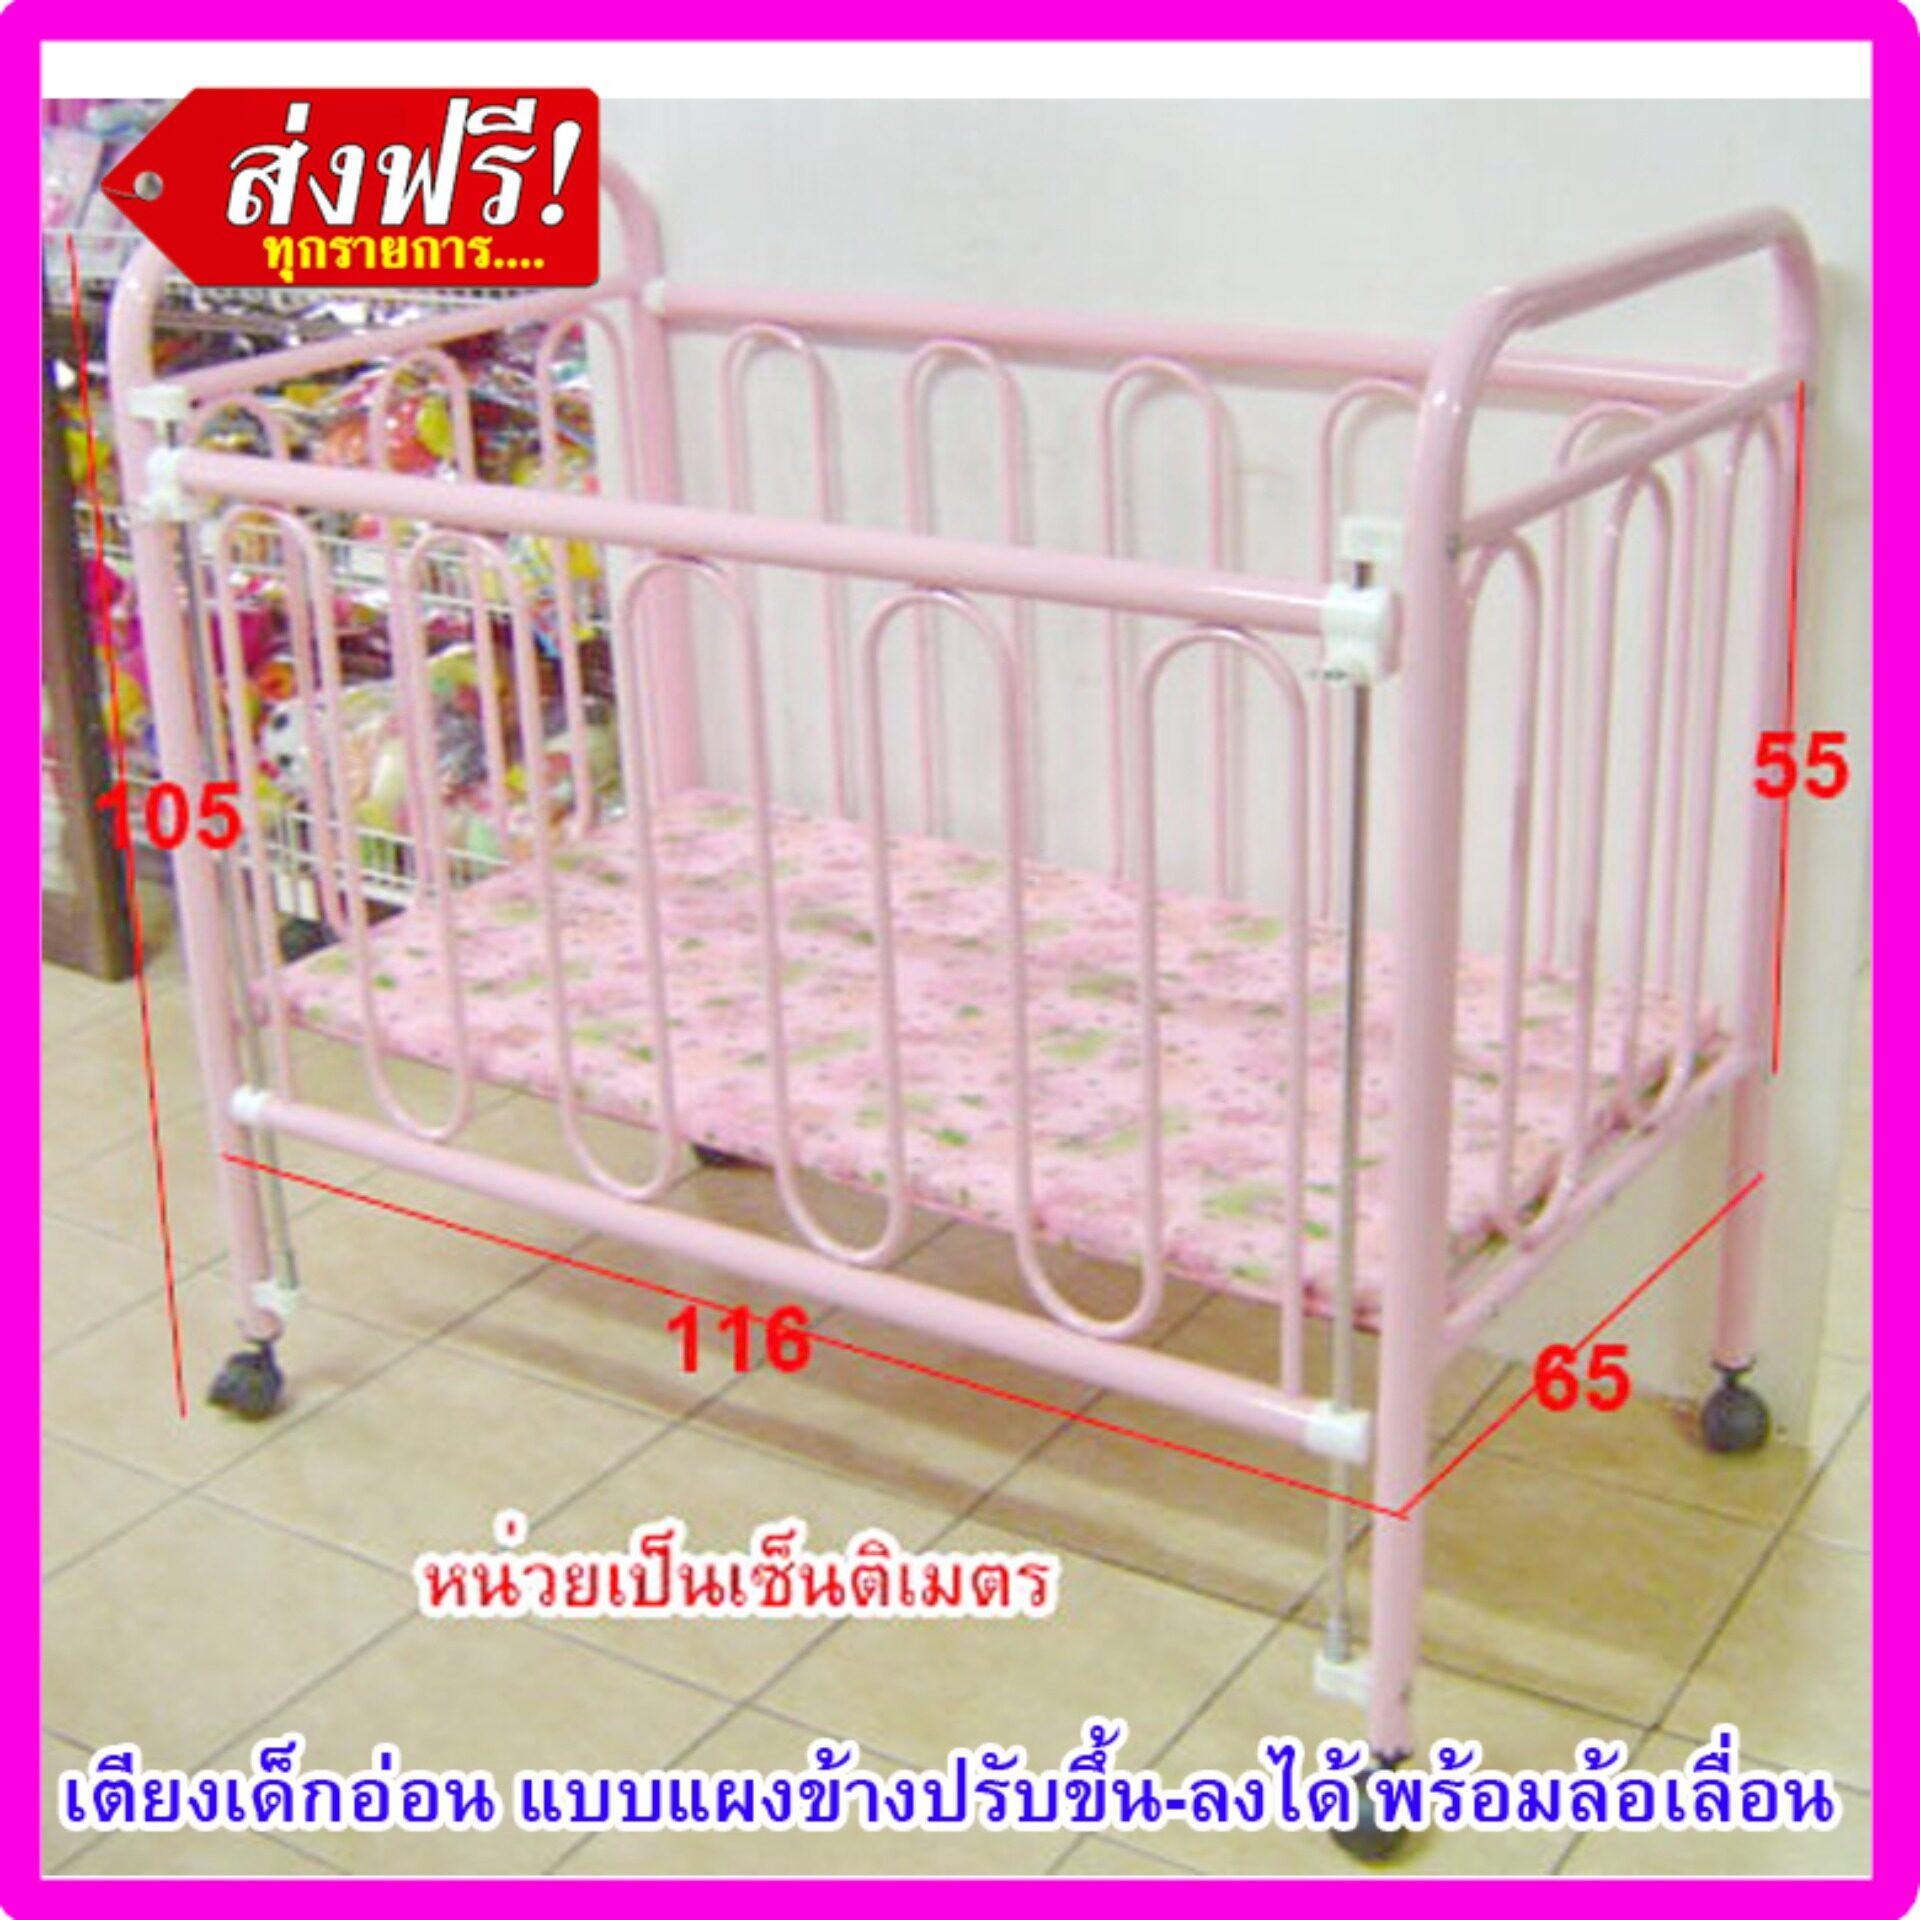 NF เตียงขังเด็ก B-41 เตียงเด็ก เตียงเด็กอ่อน ปรับประตูขึ้น-ลงได้ มีล้อเลื่อน สำหรับเด็กทารกแรกเกิด ถึง 2.5 ขวบ พร้อมที่นอน ในกล่อง